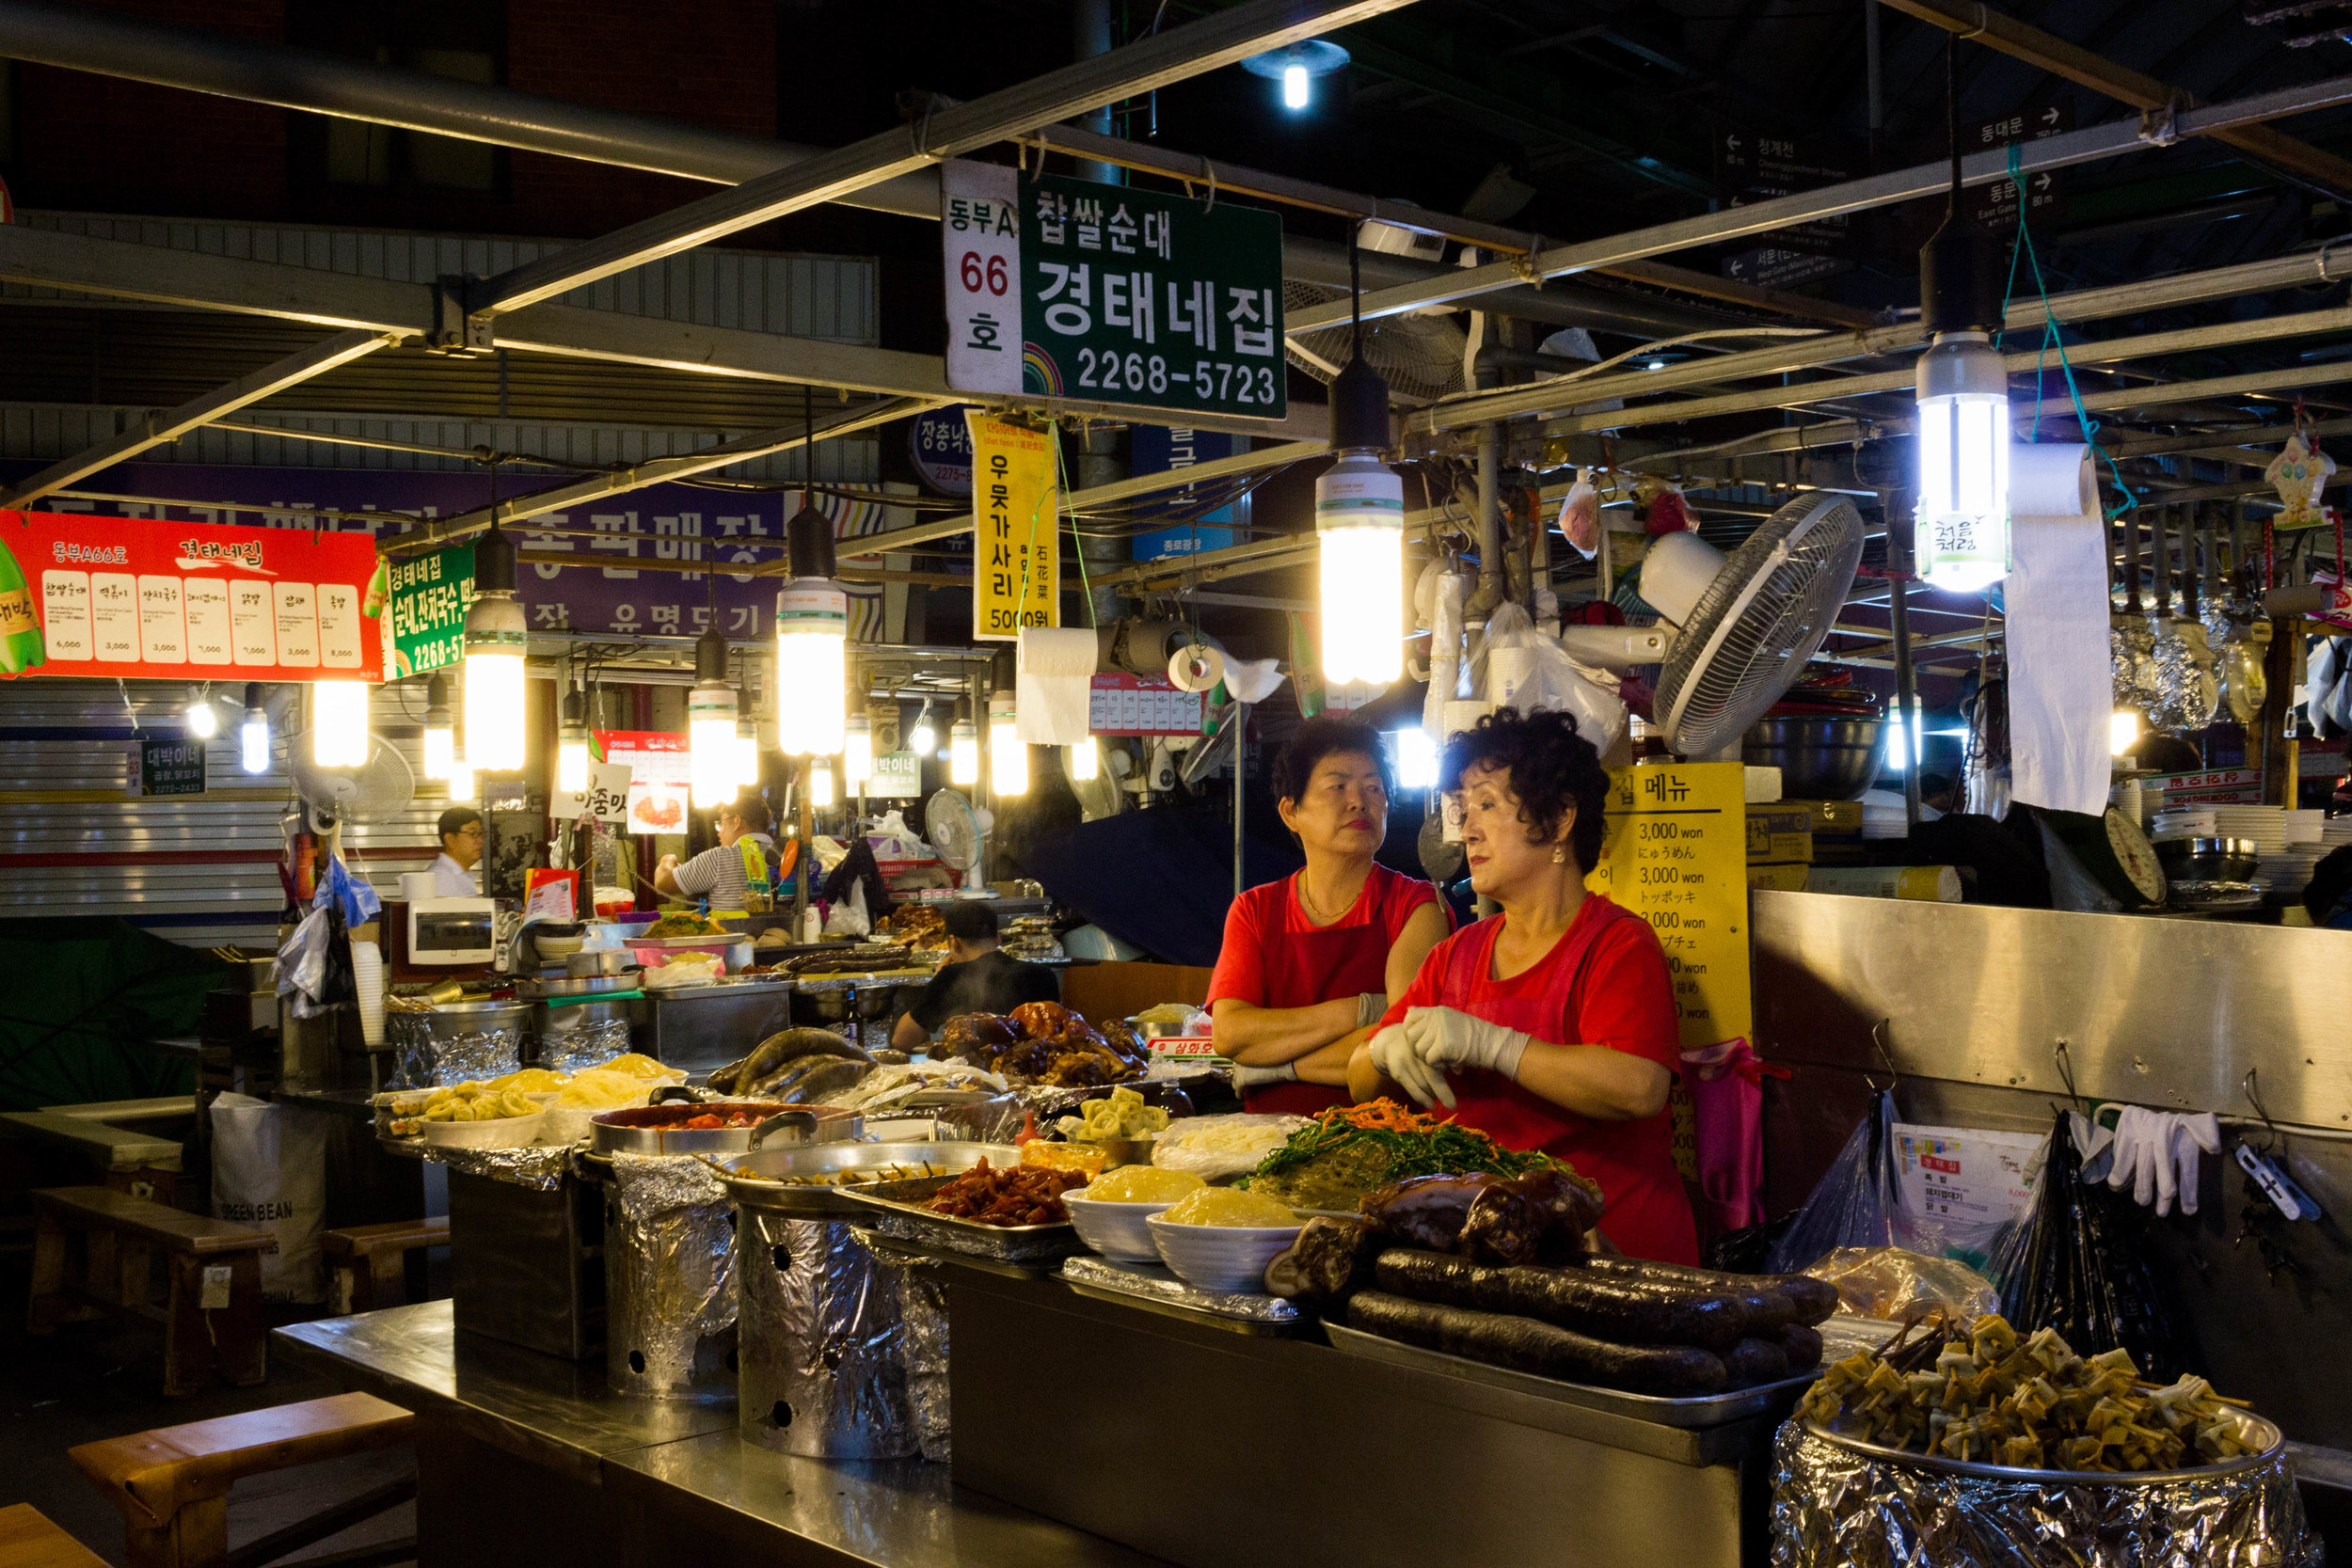 Vendors at DongDaemun Night Market